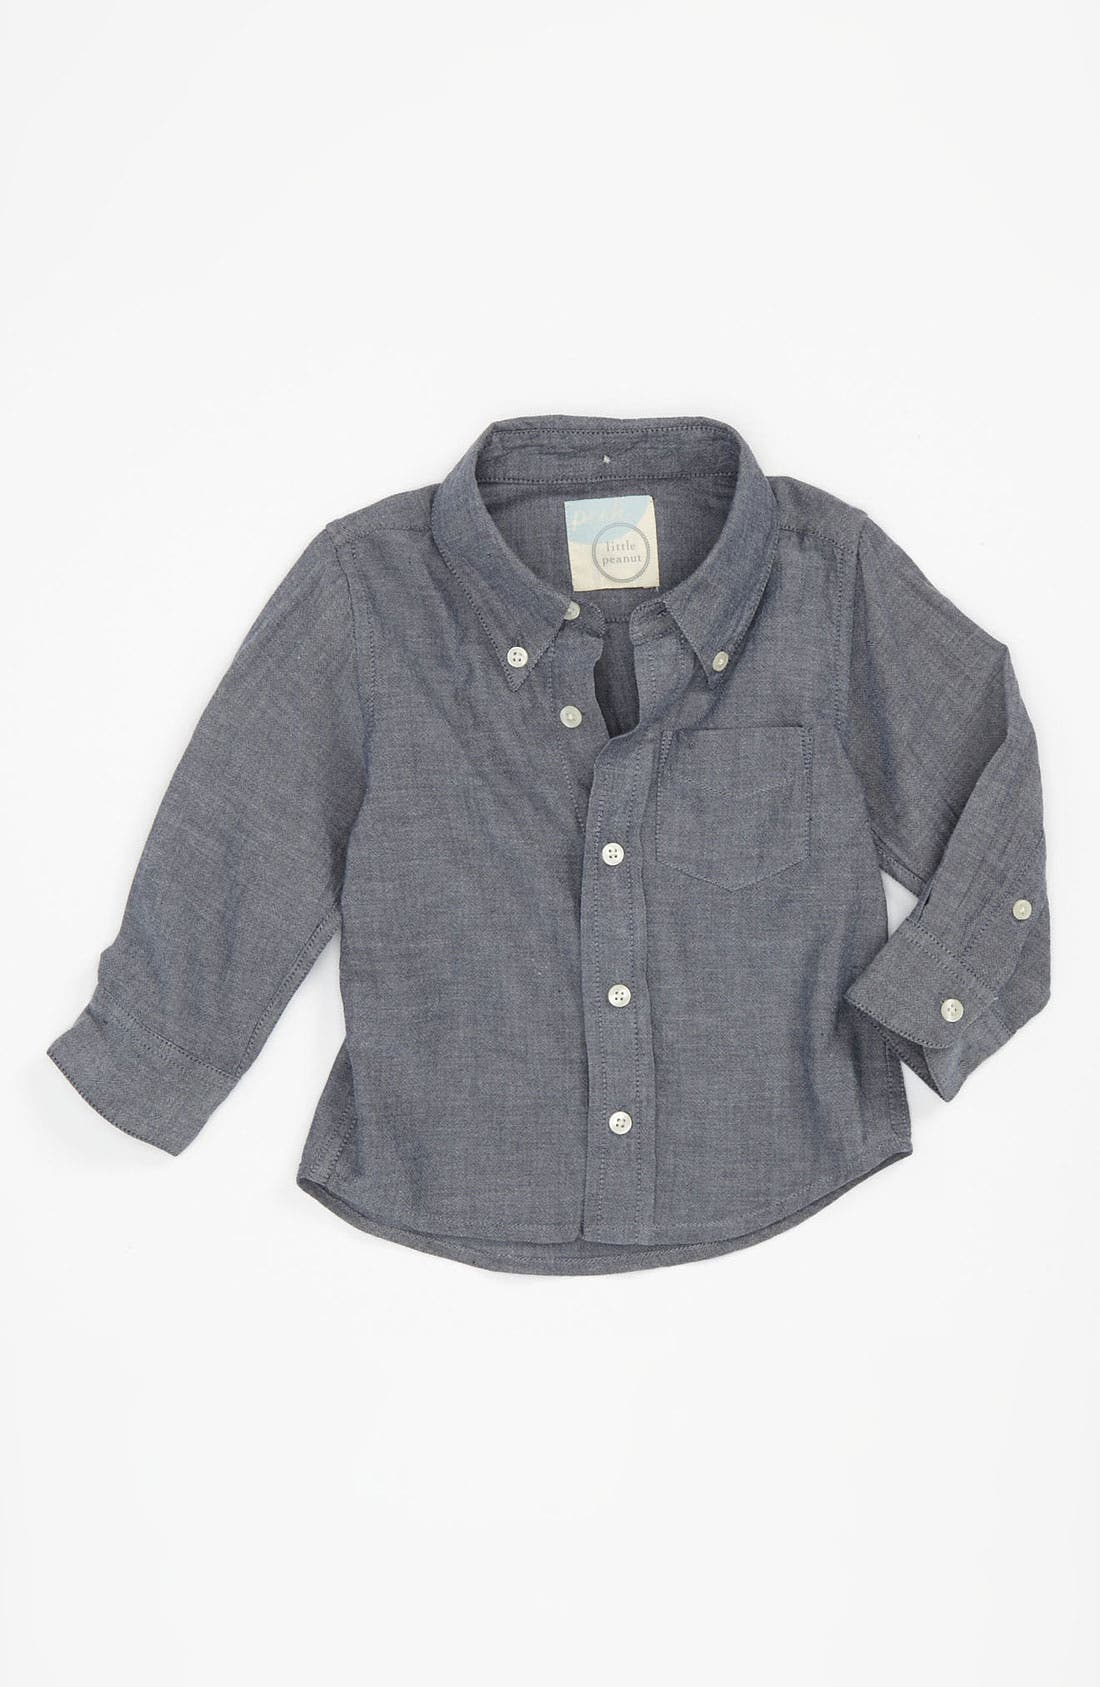 Alternate Image 1 Selected - Peek 'Clifton' Chambray Shirt (Infant)